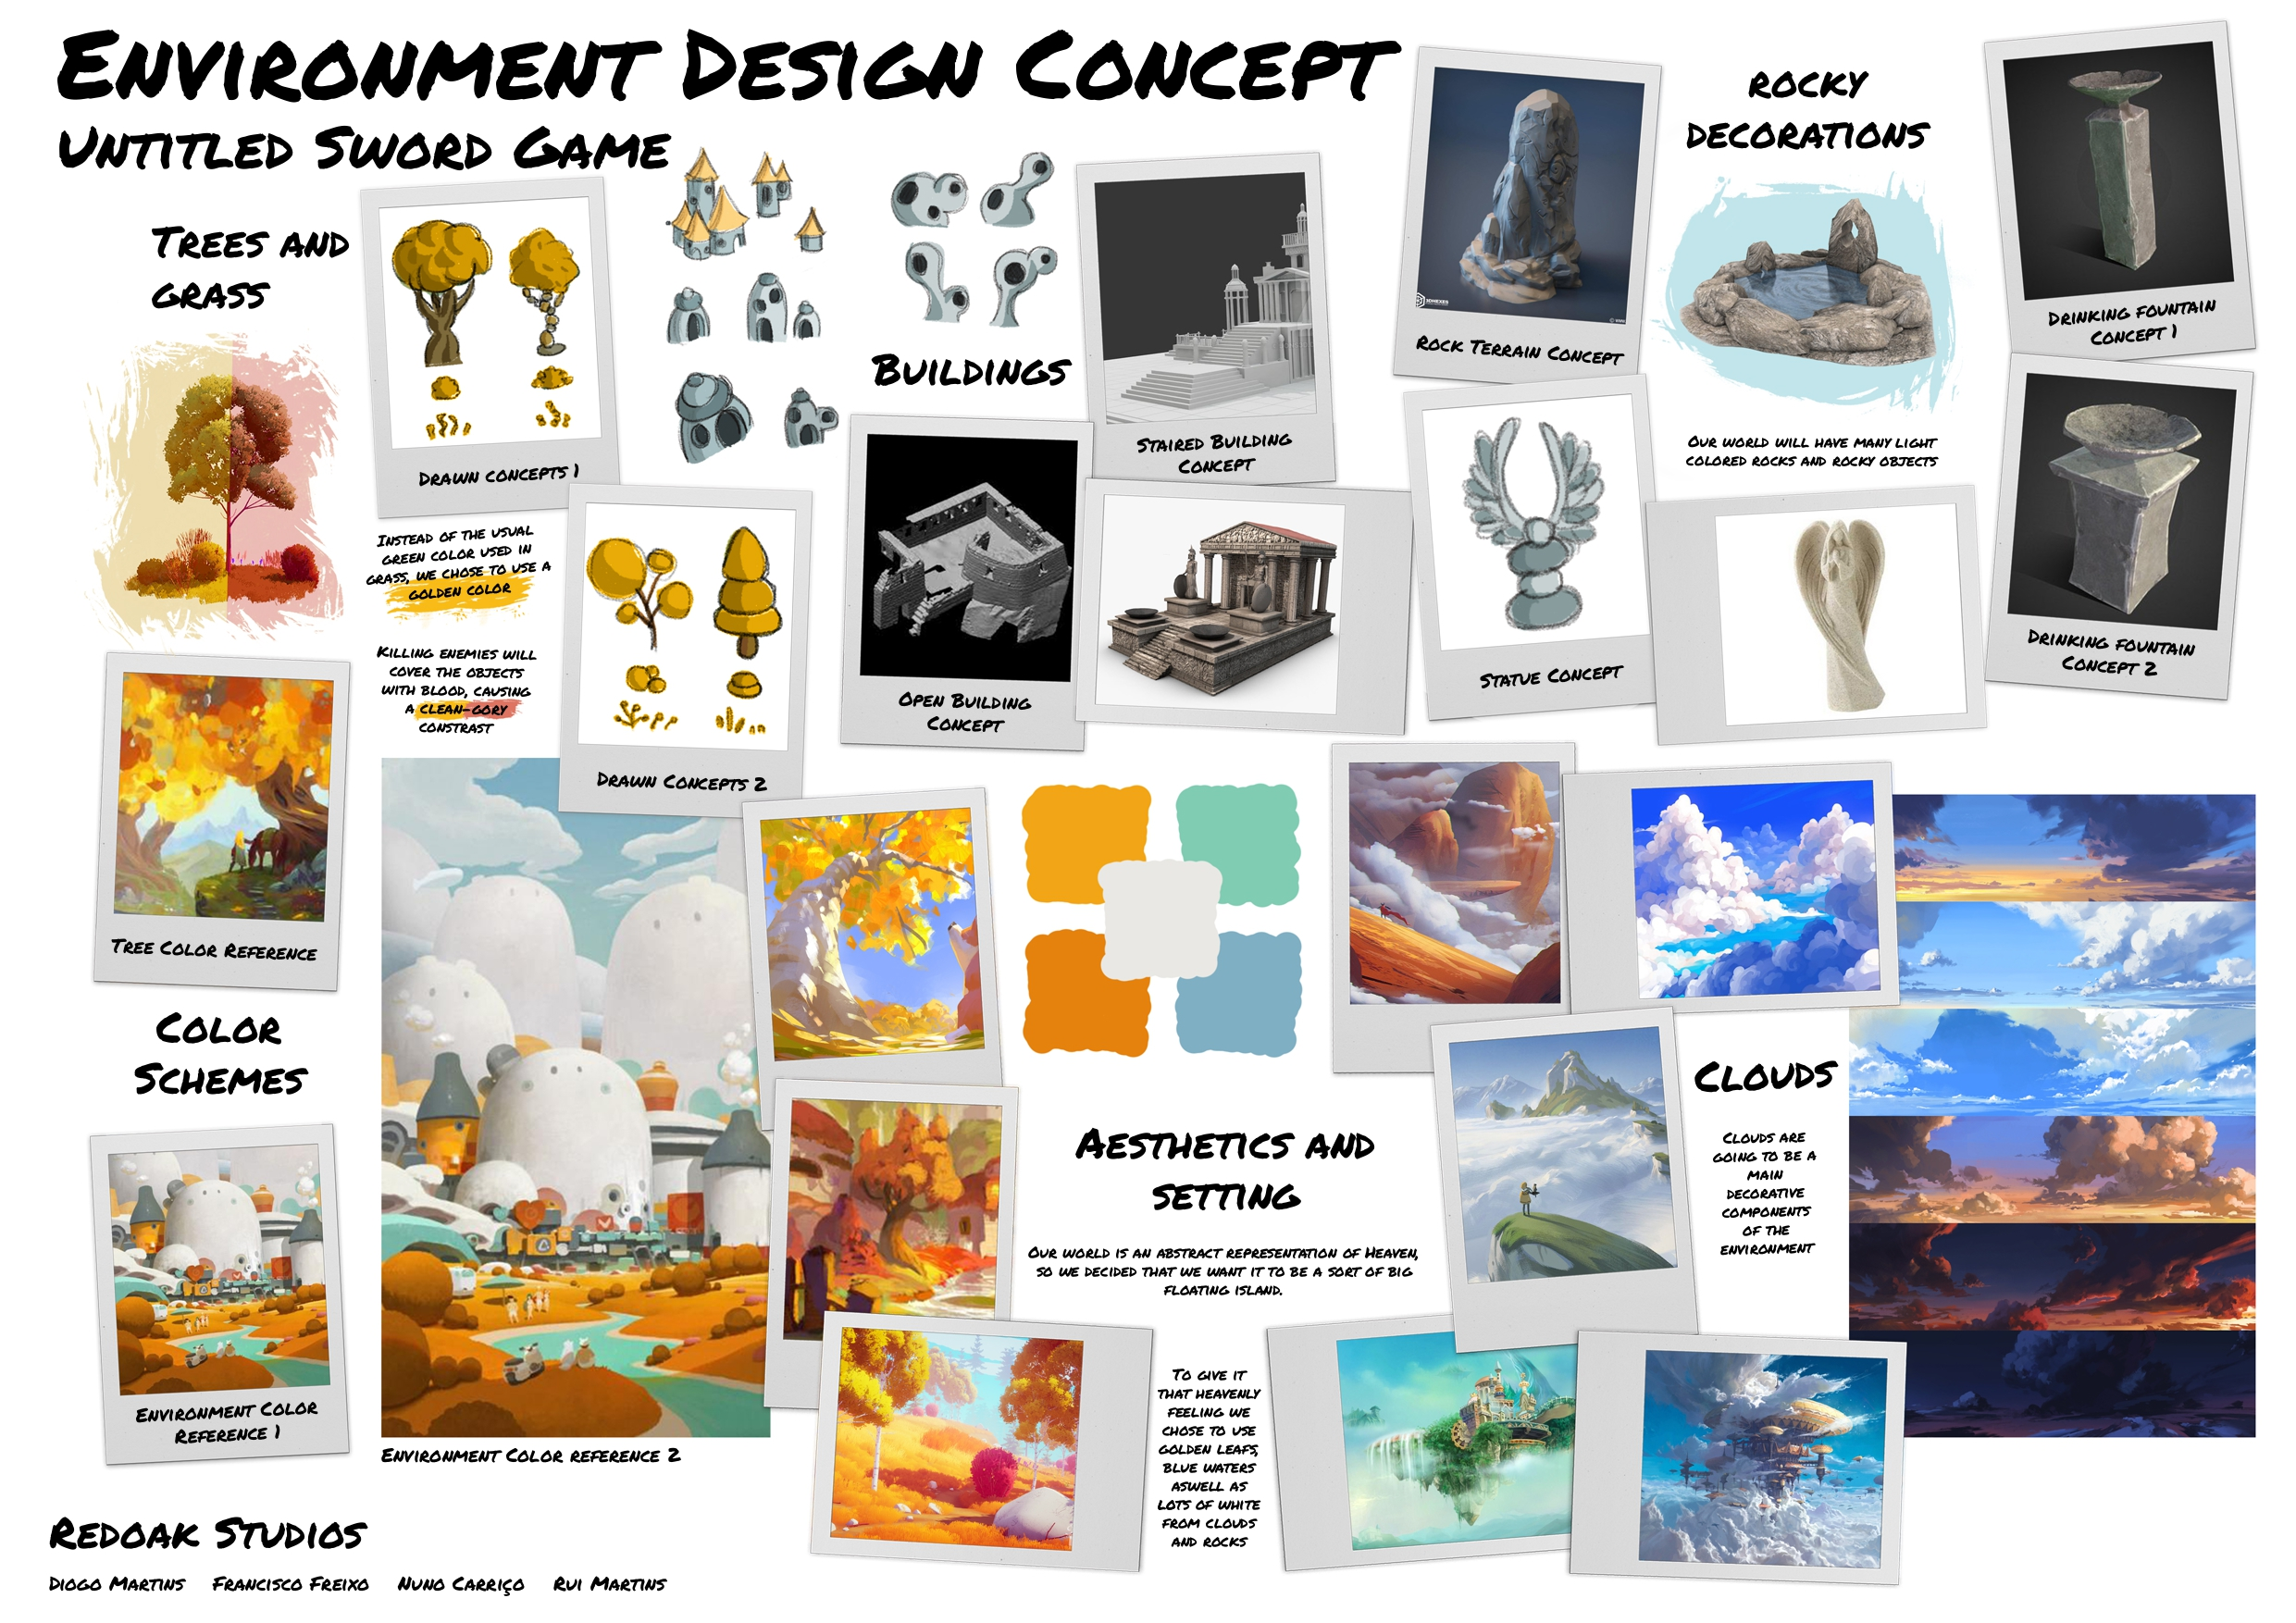 Prancha Environment Concept page